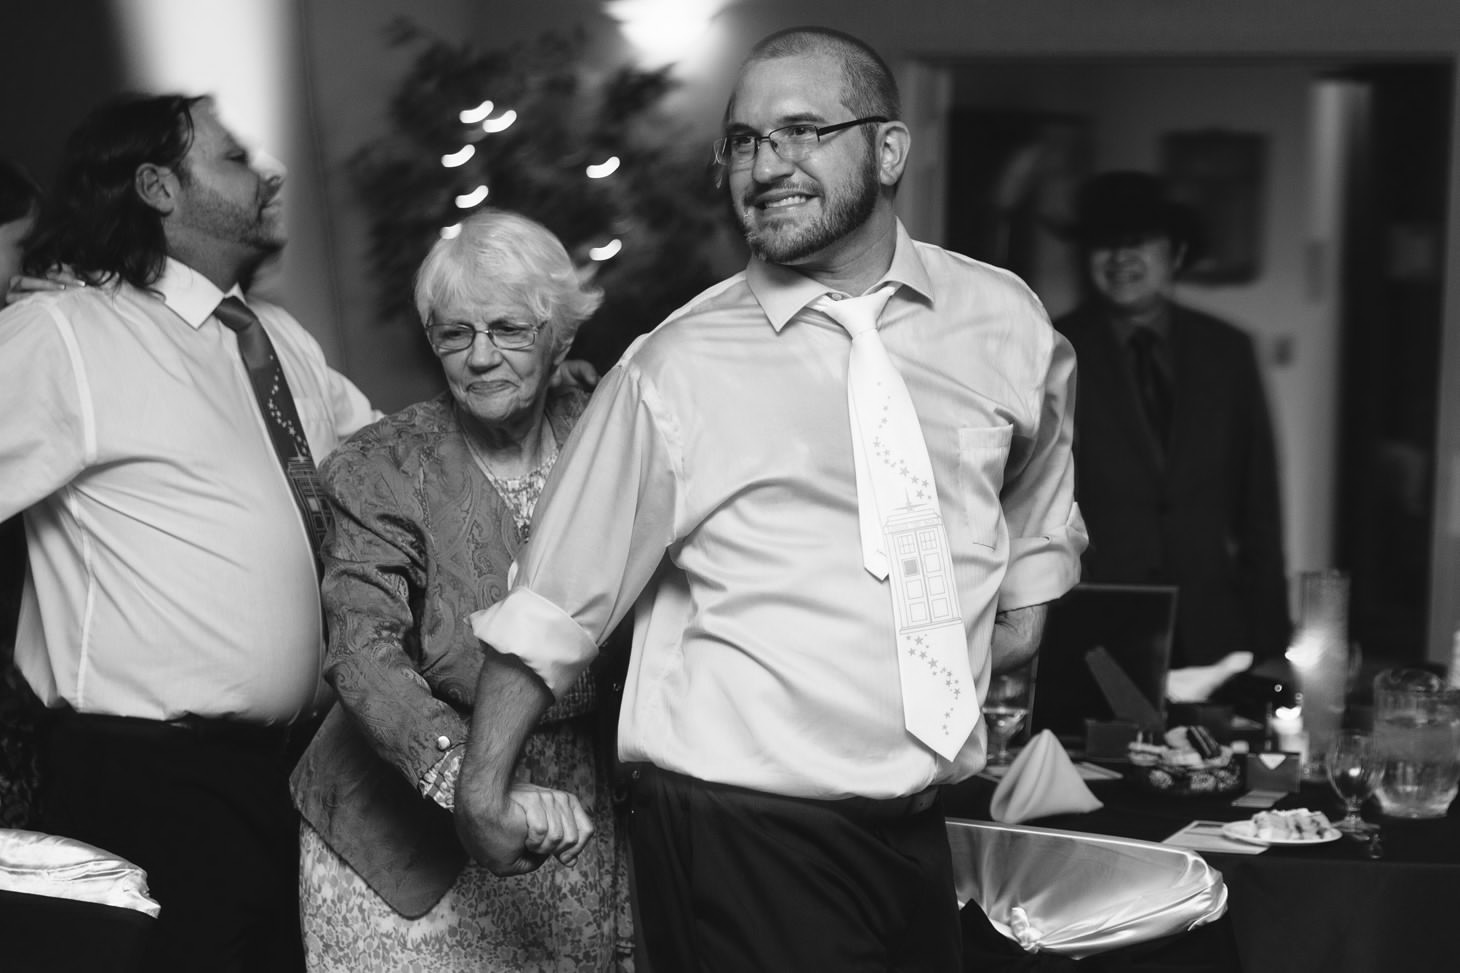 058-nyc-wedding-photographer-nj-nerdy-dr-who-firehouse-wedding-smitten-chickens.jpg